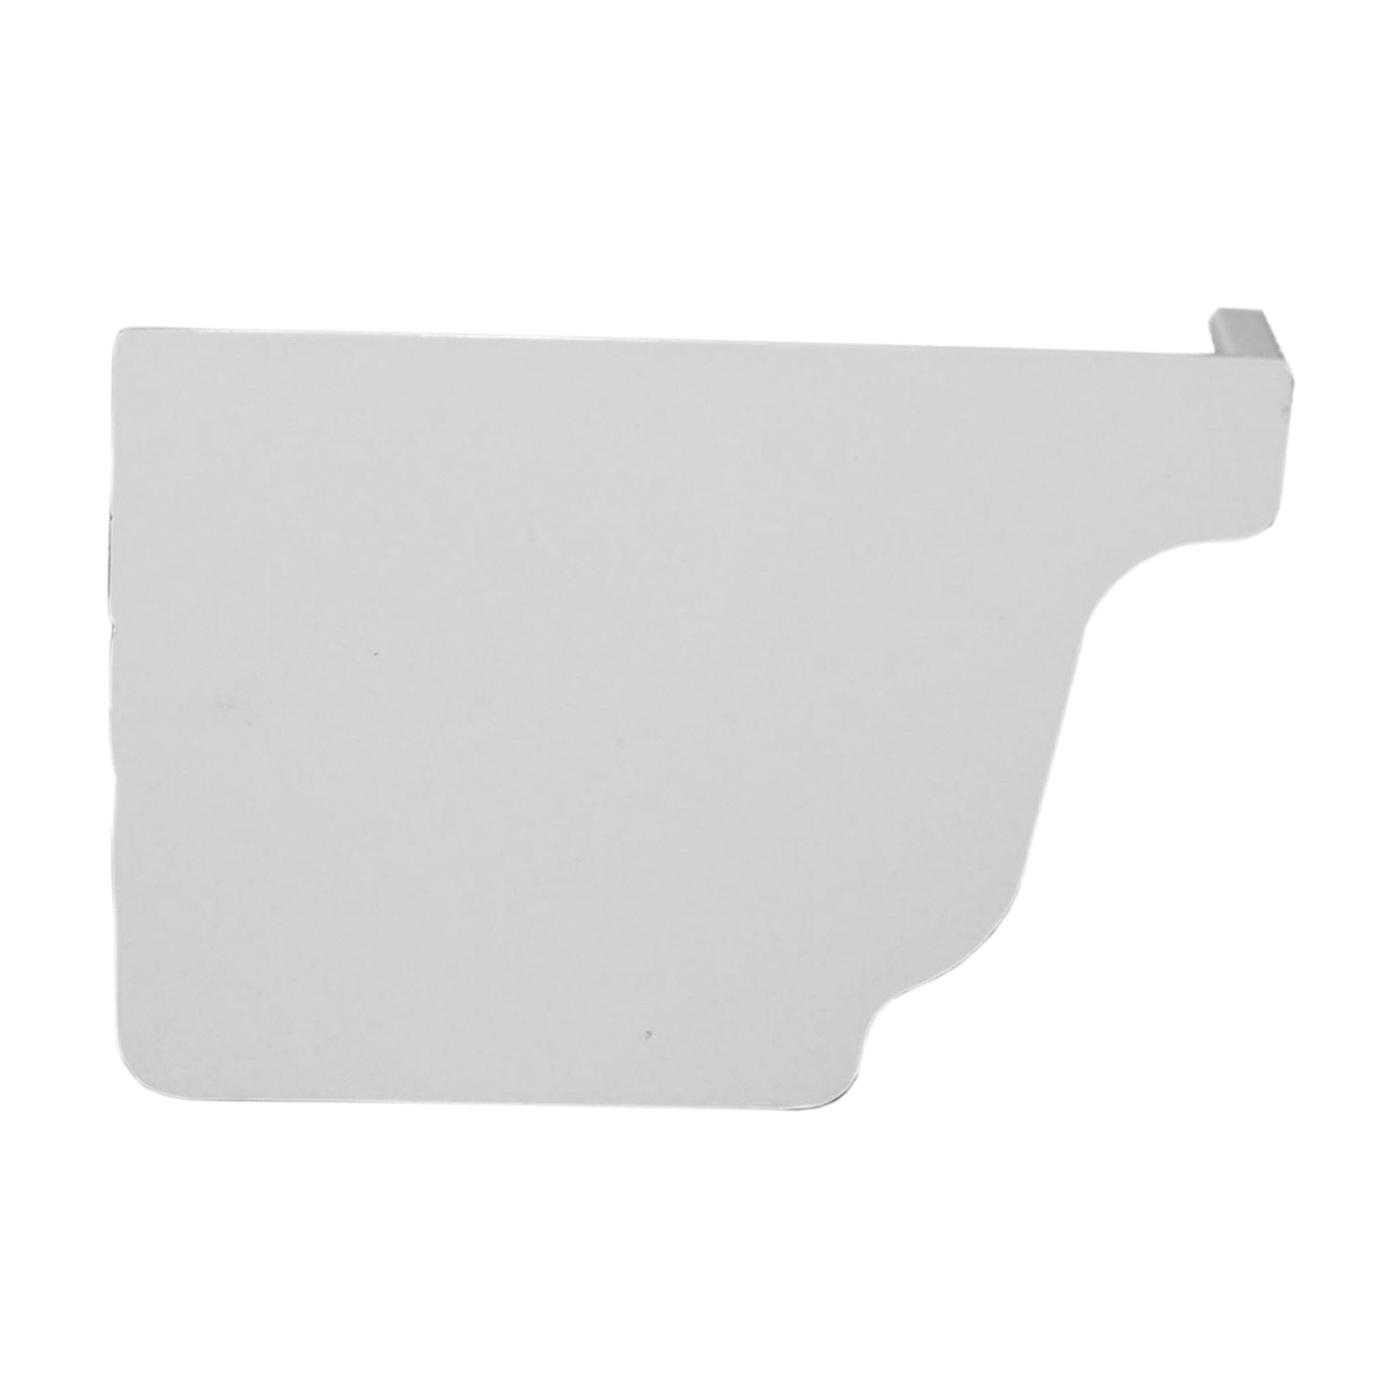 Picture of GENOVA AW102K Gutter End Cap, 3.6 in L, 1.1 in W, Vinyl, White, For: 5 in Repla K Gutter